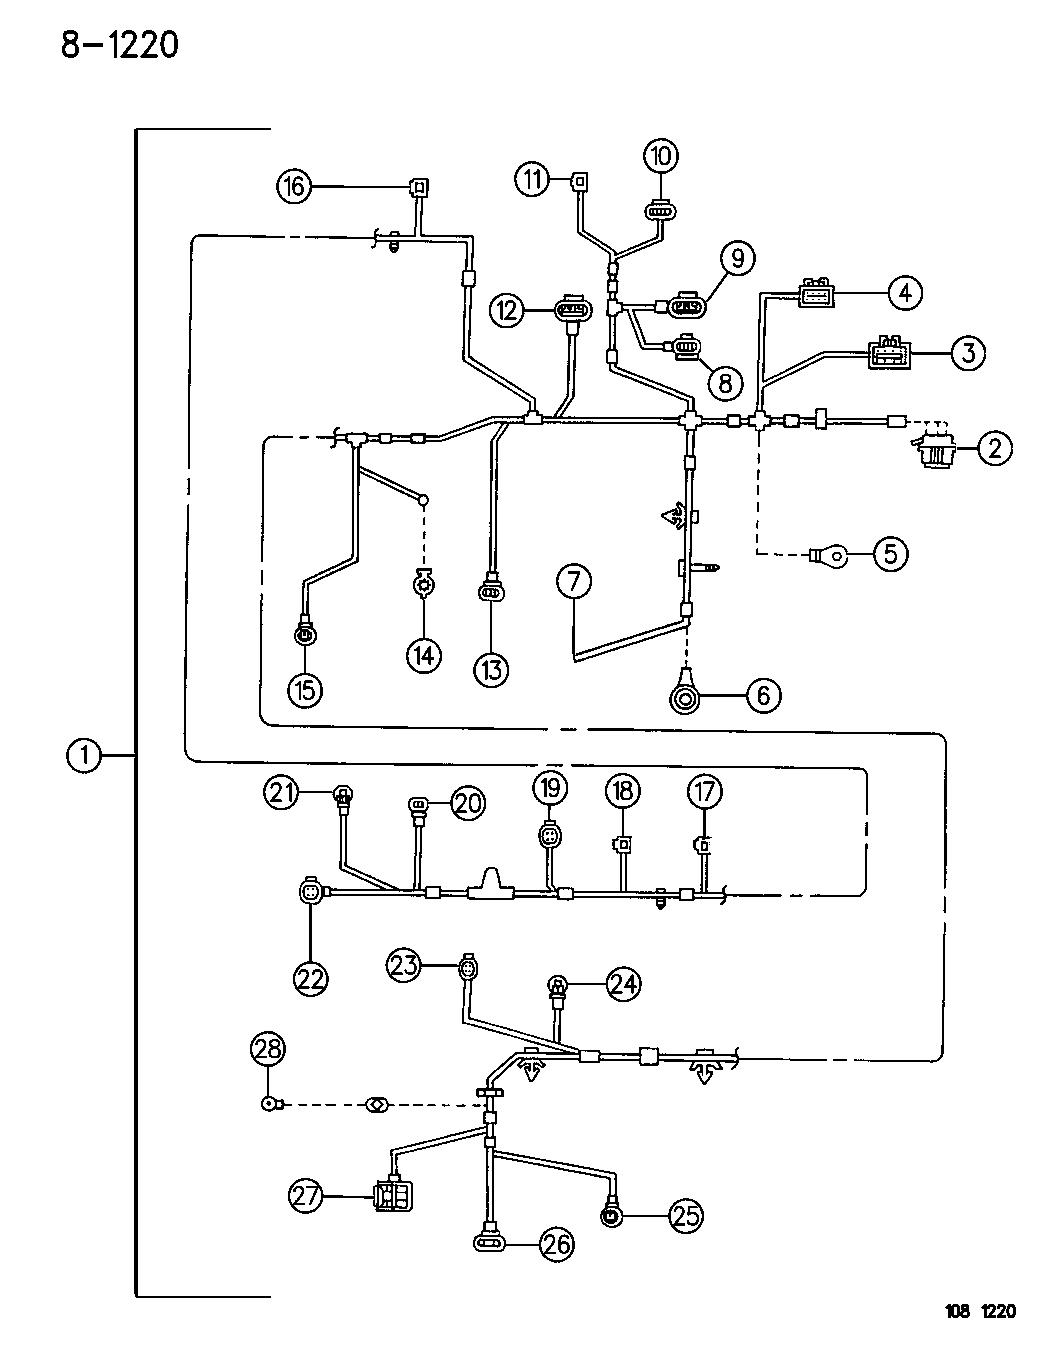 1996 Dodge Stratus Wiring Diagram Wiring Diagram Seek Limit A Seek Limit A Cfcarsnoleggio It